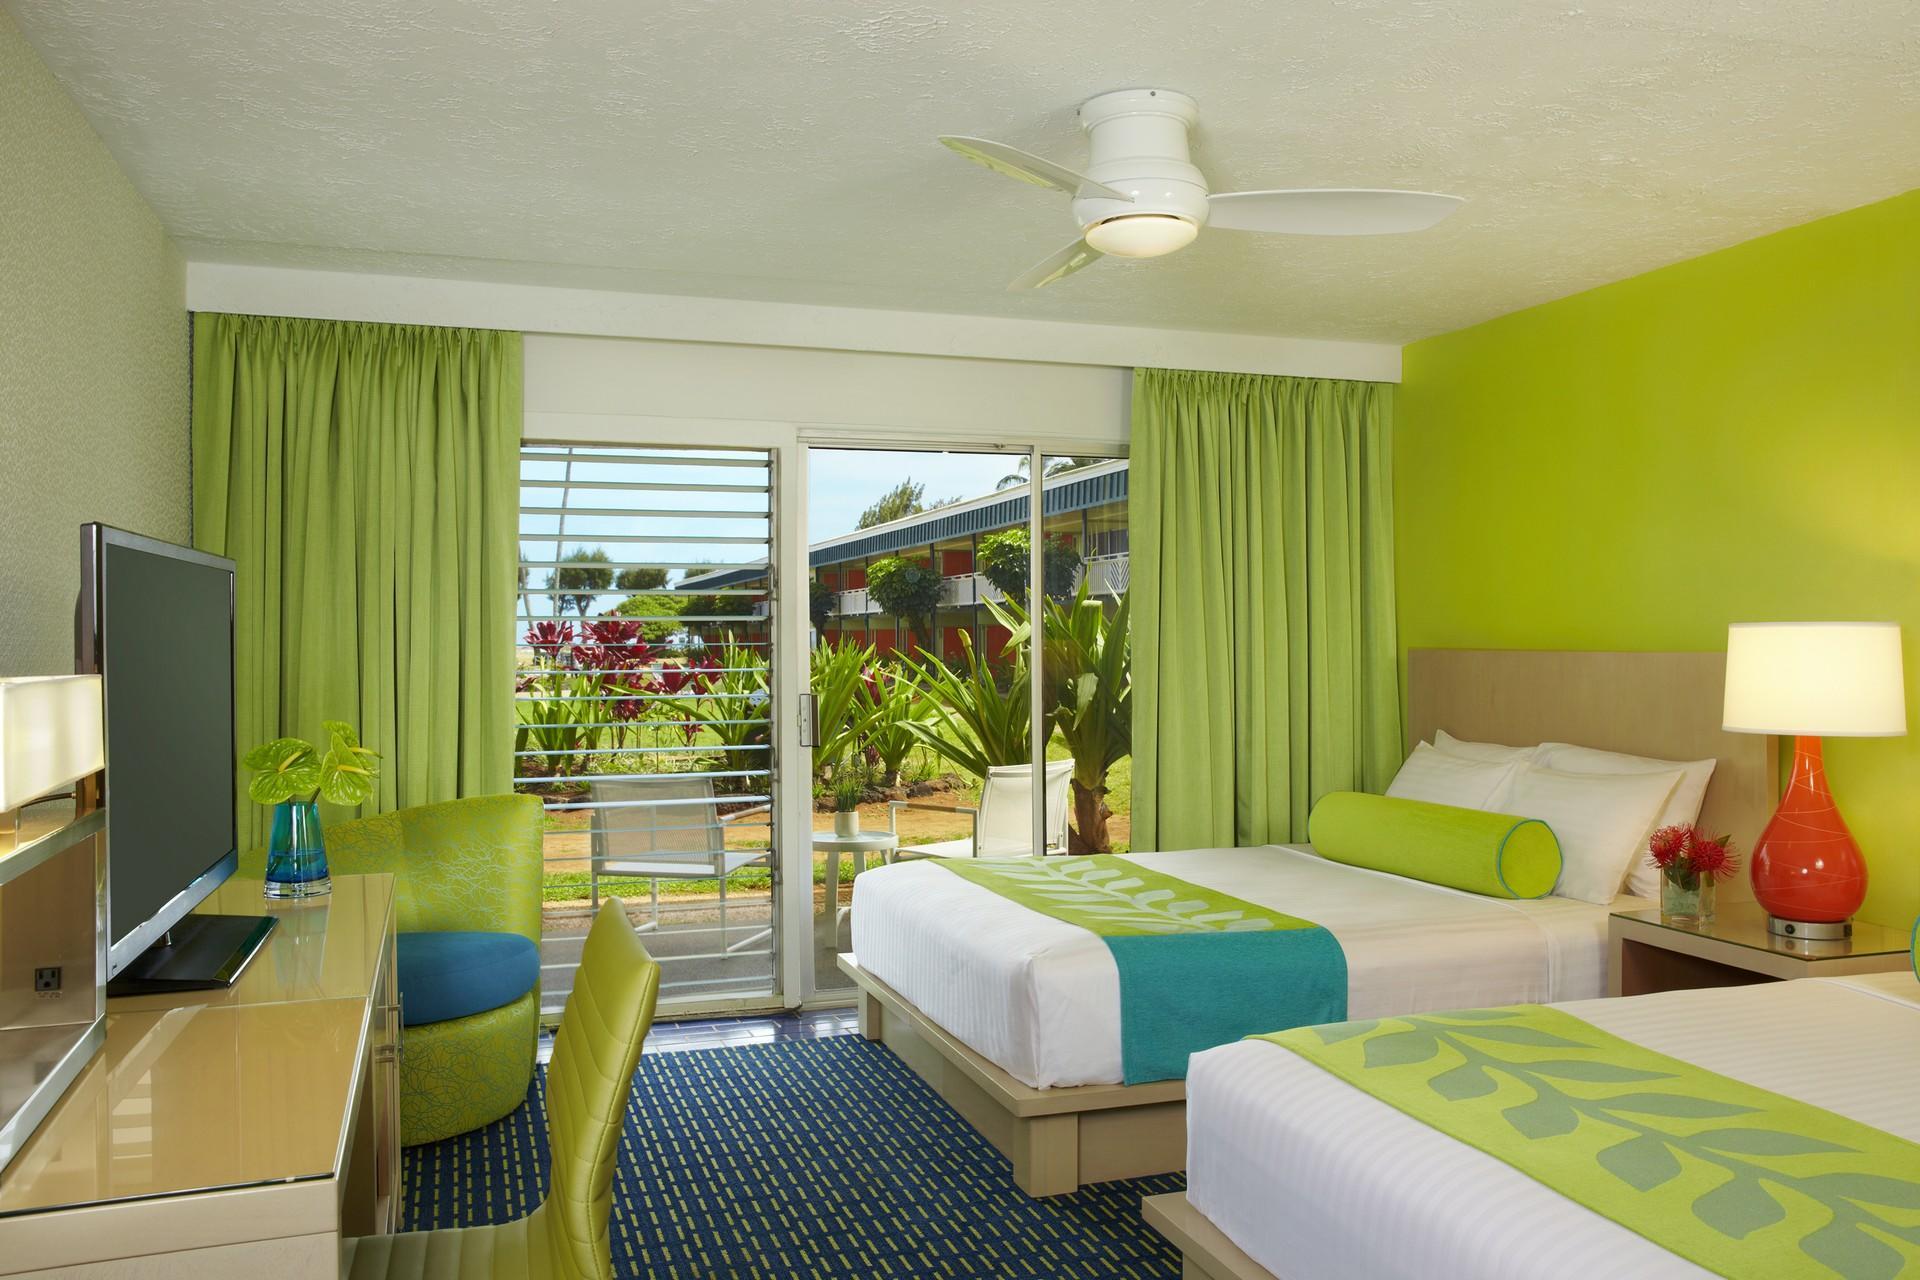 Kauai Shores Hotel image 6